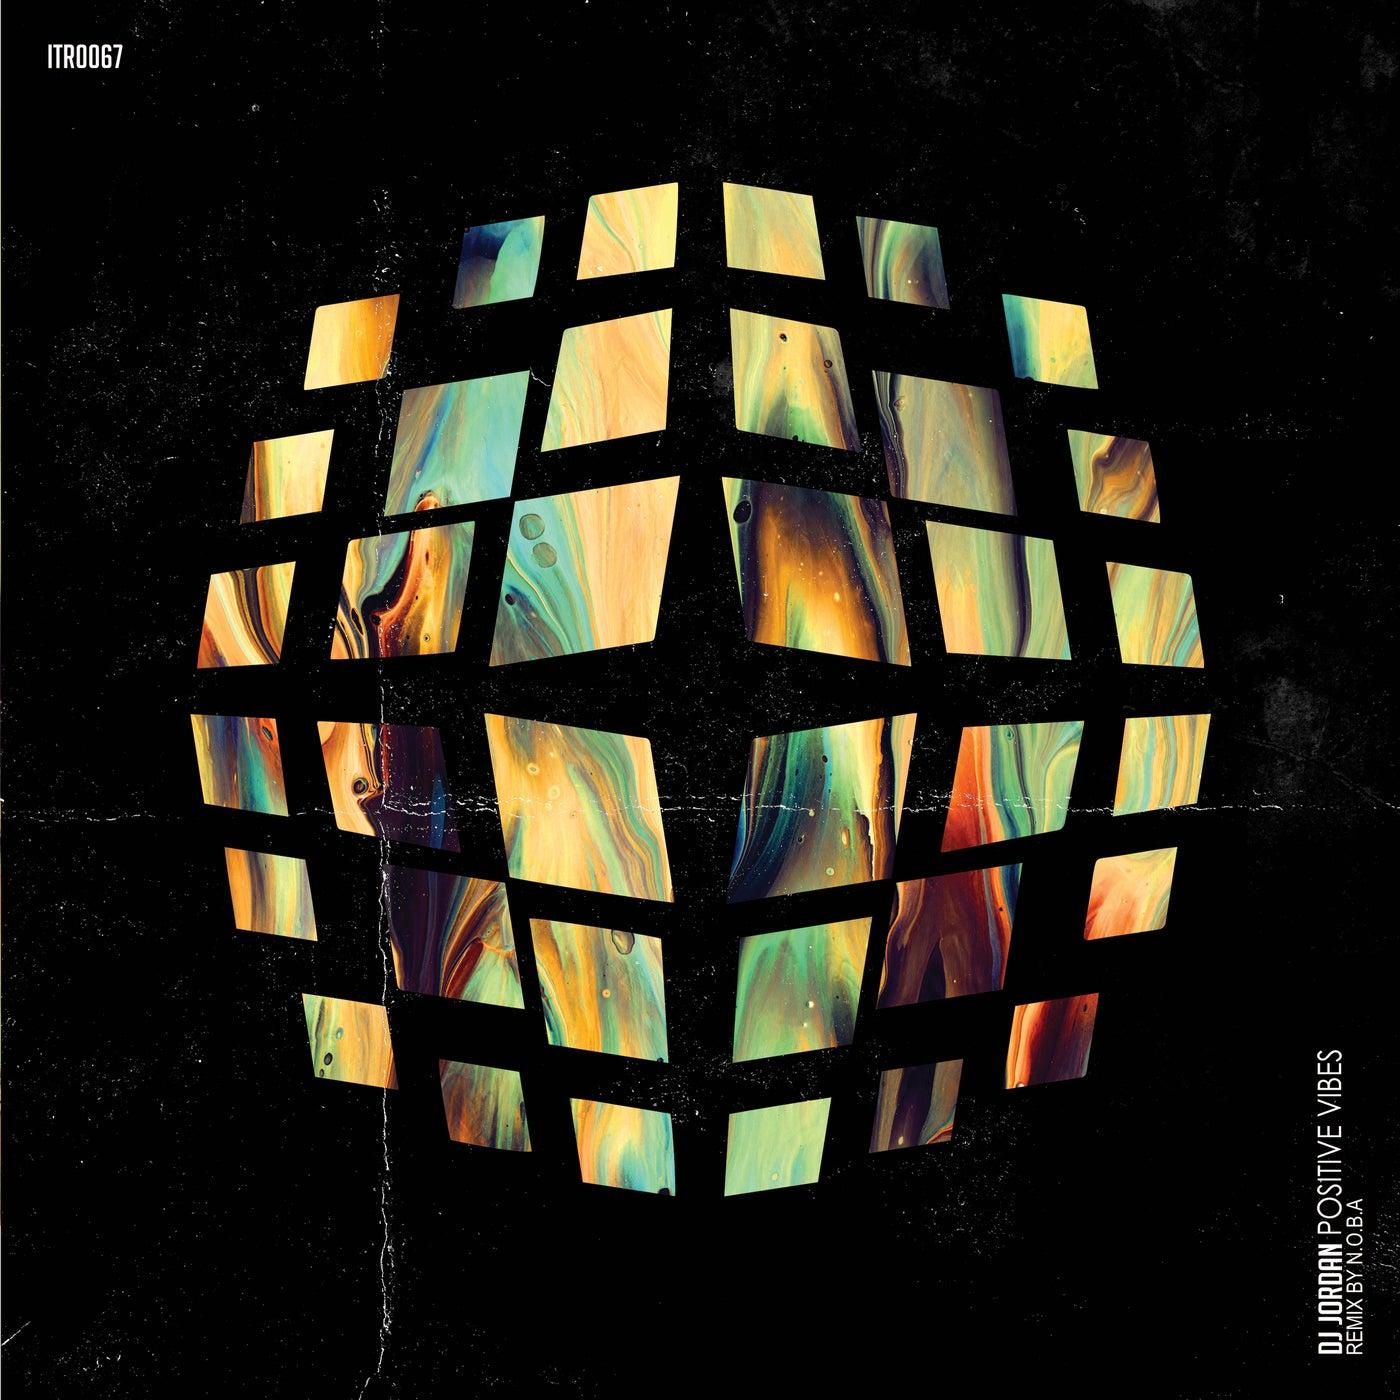 Positive Vibes (N.O.B.A Remix)